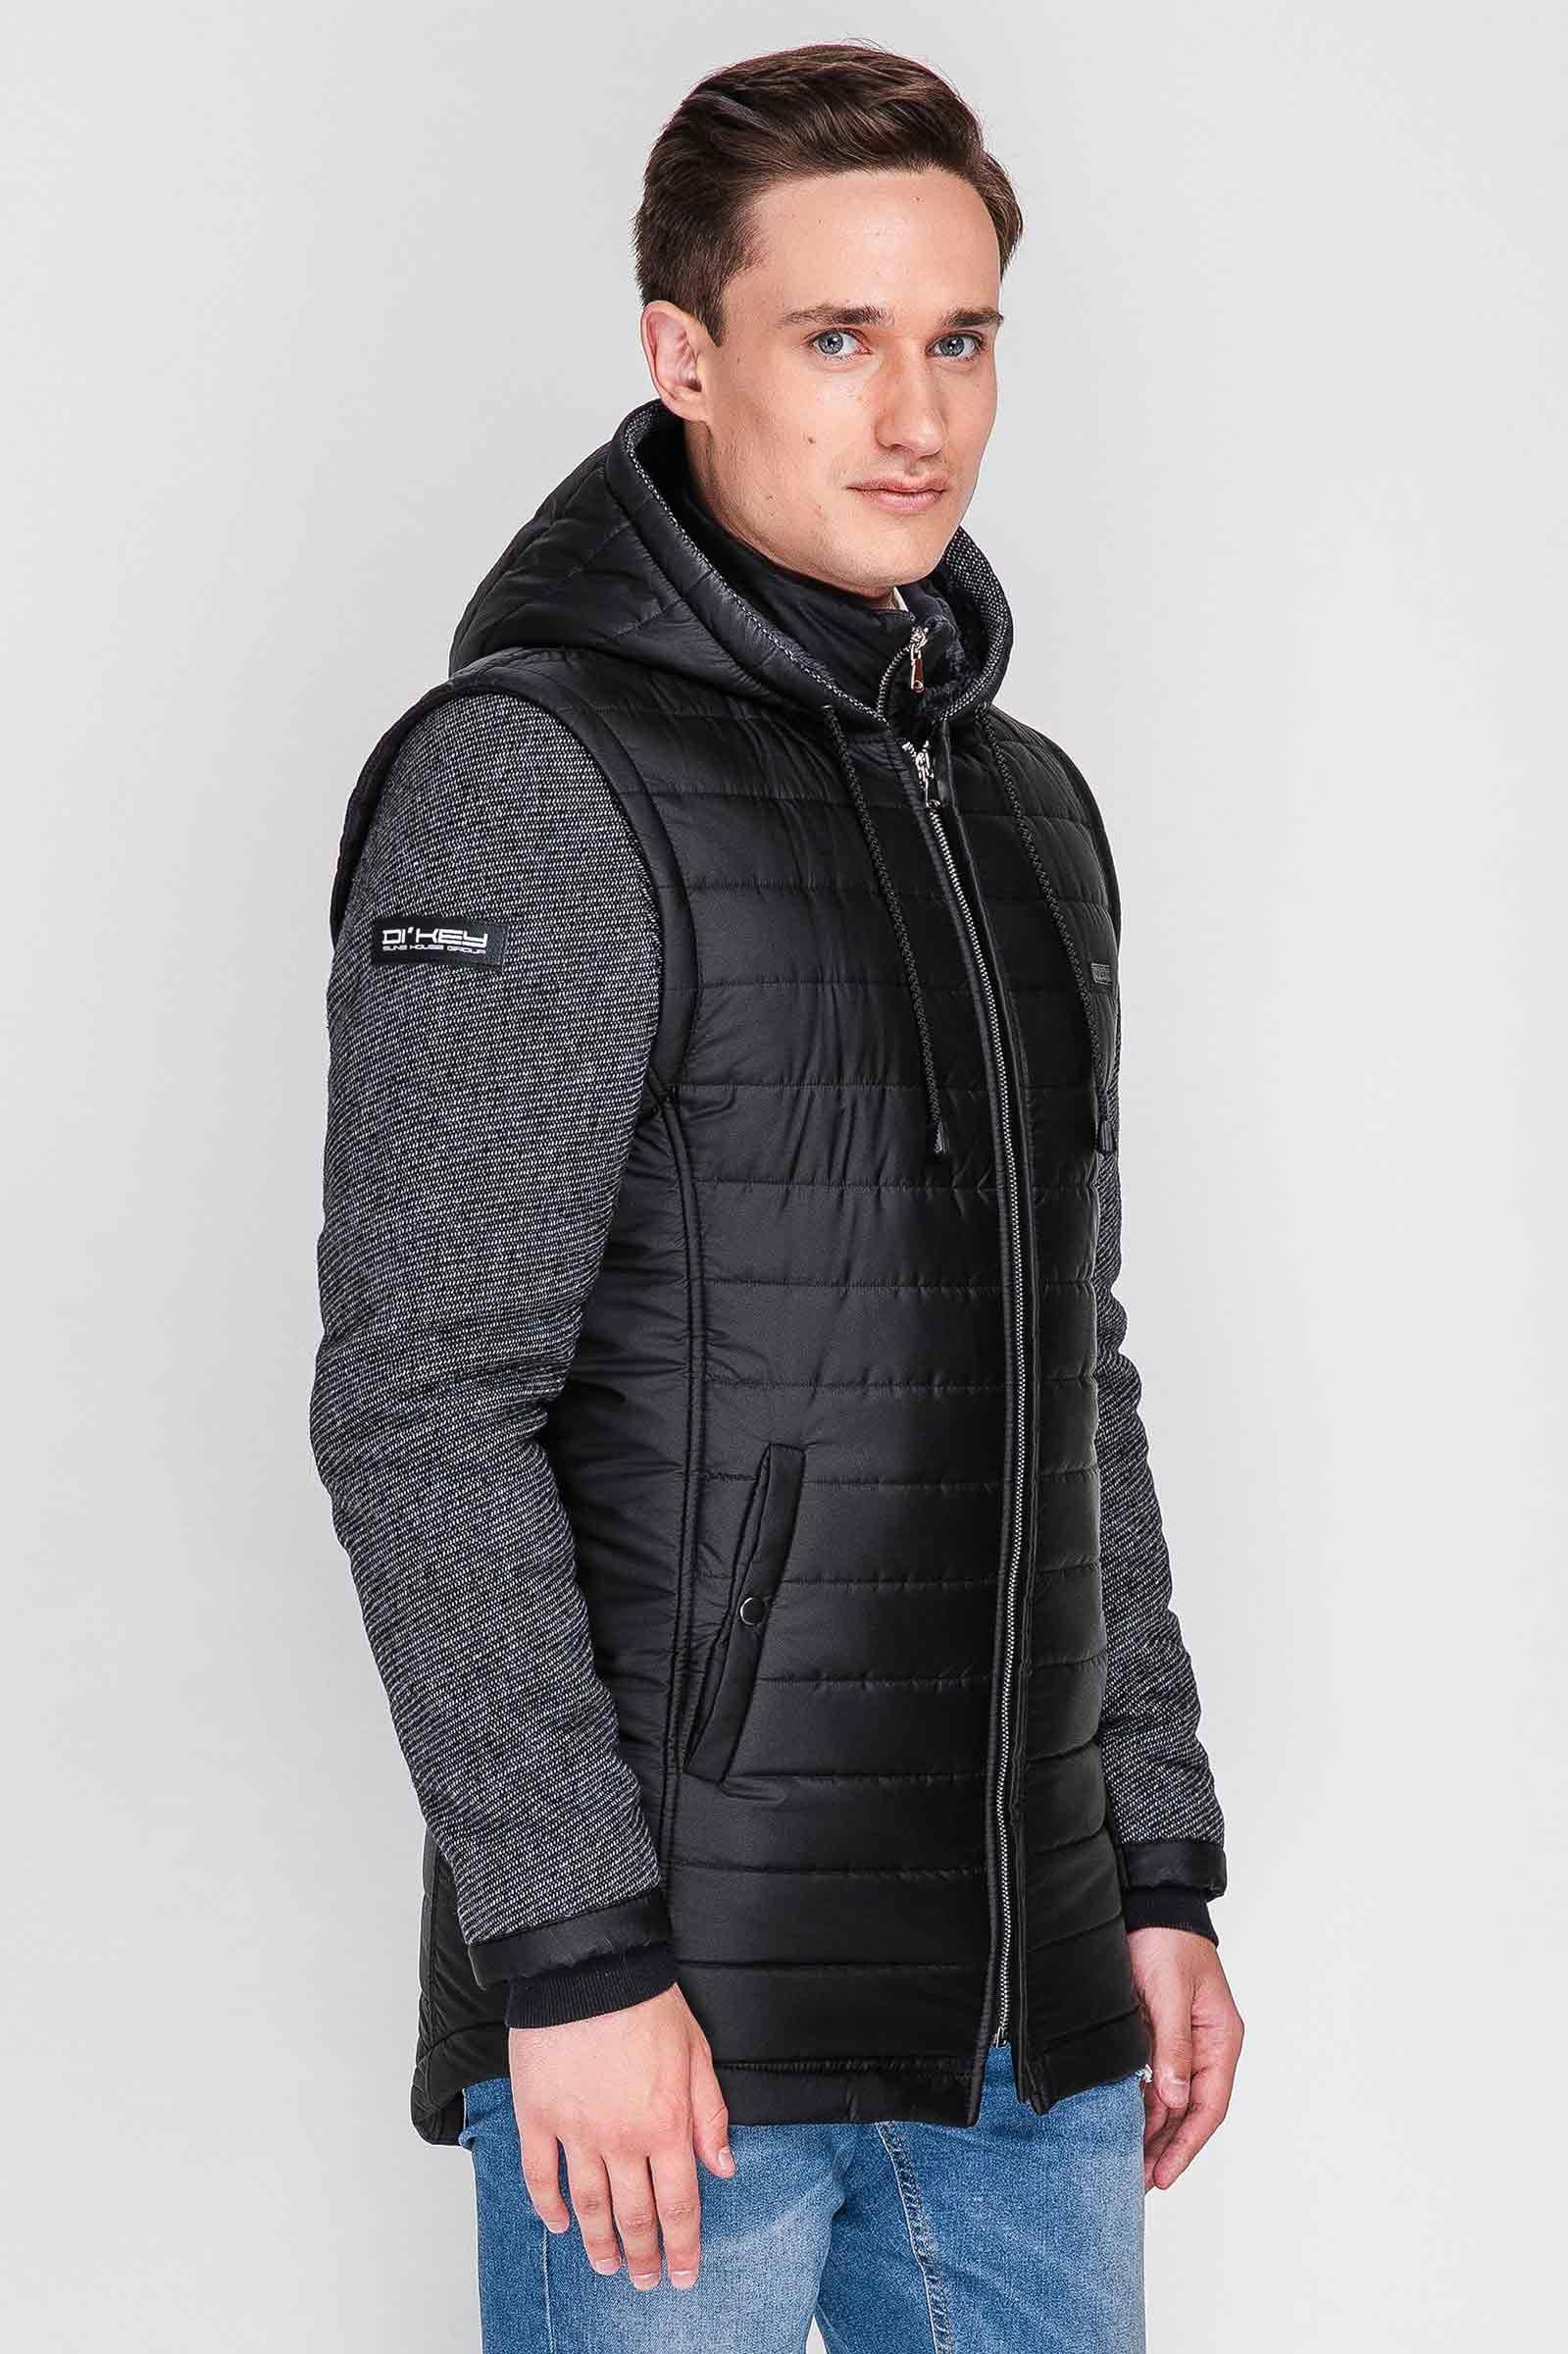 Мужская куртка дешево Одесса